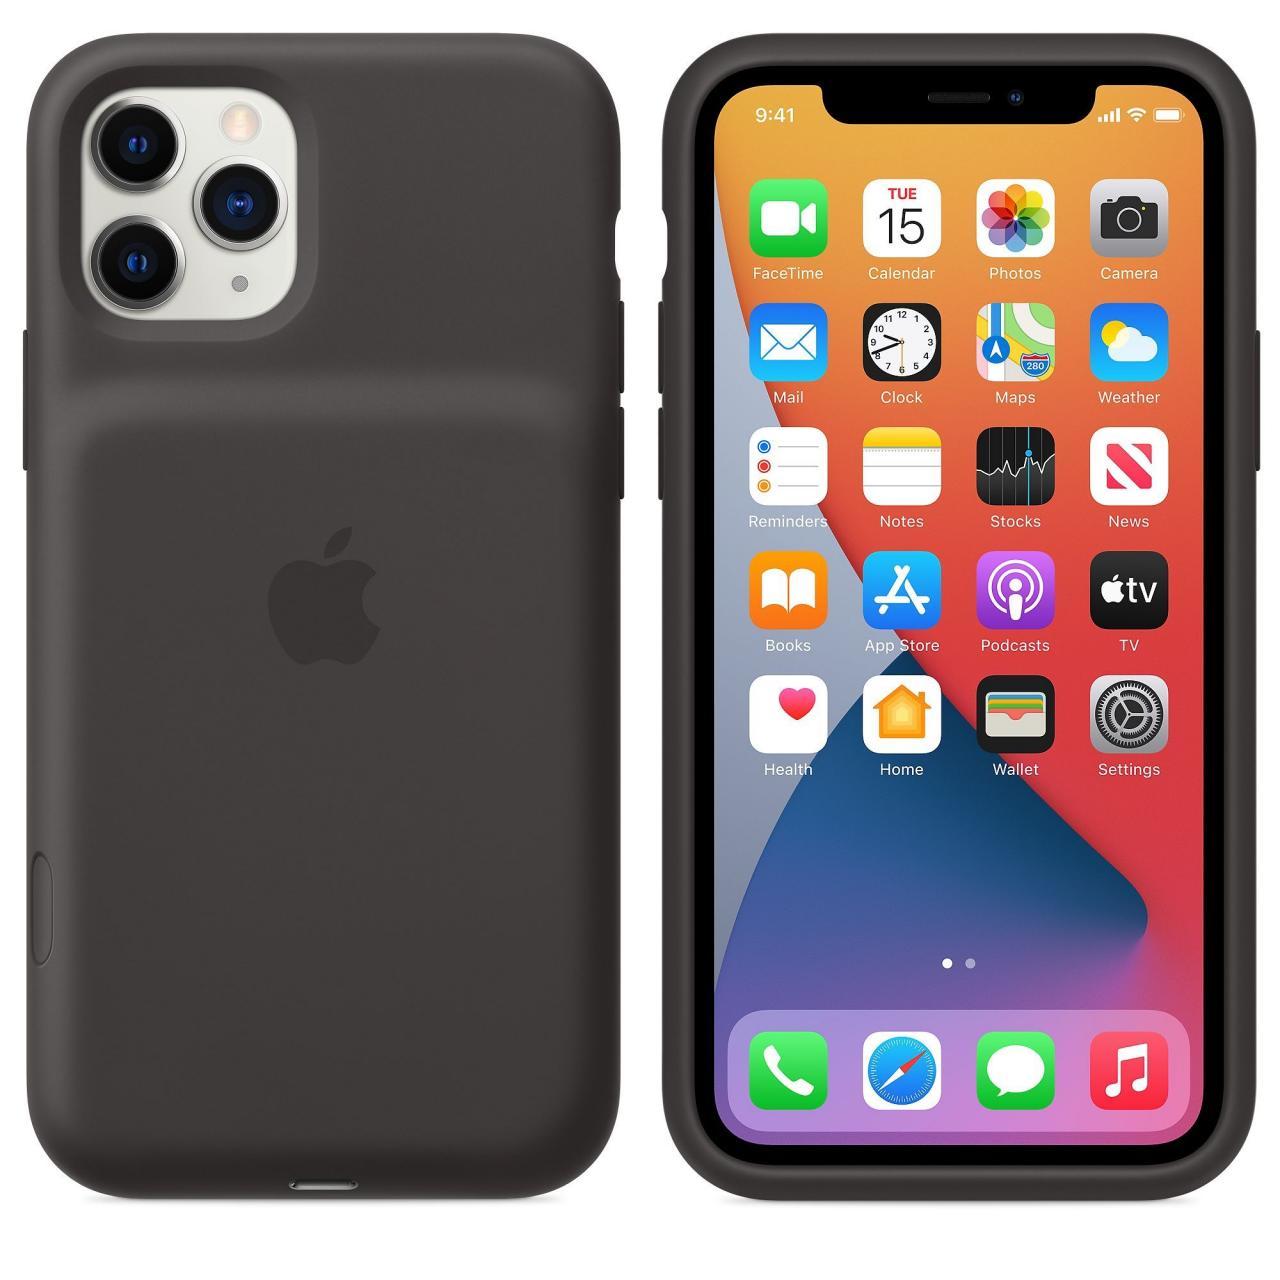 Cómo ahorrar batería en iPhone 12 mini, iPhone 12, iPhone 12 Pro, iPhone 12 Pro Max